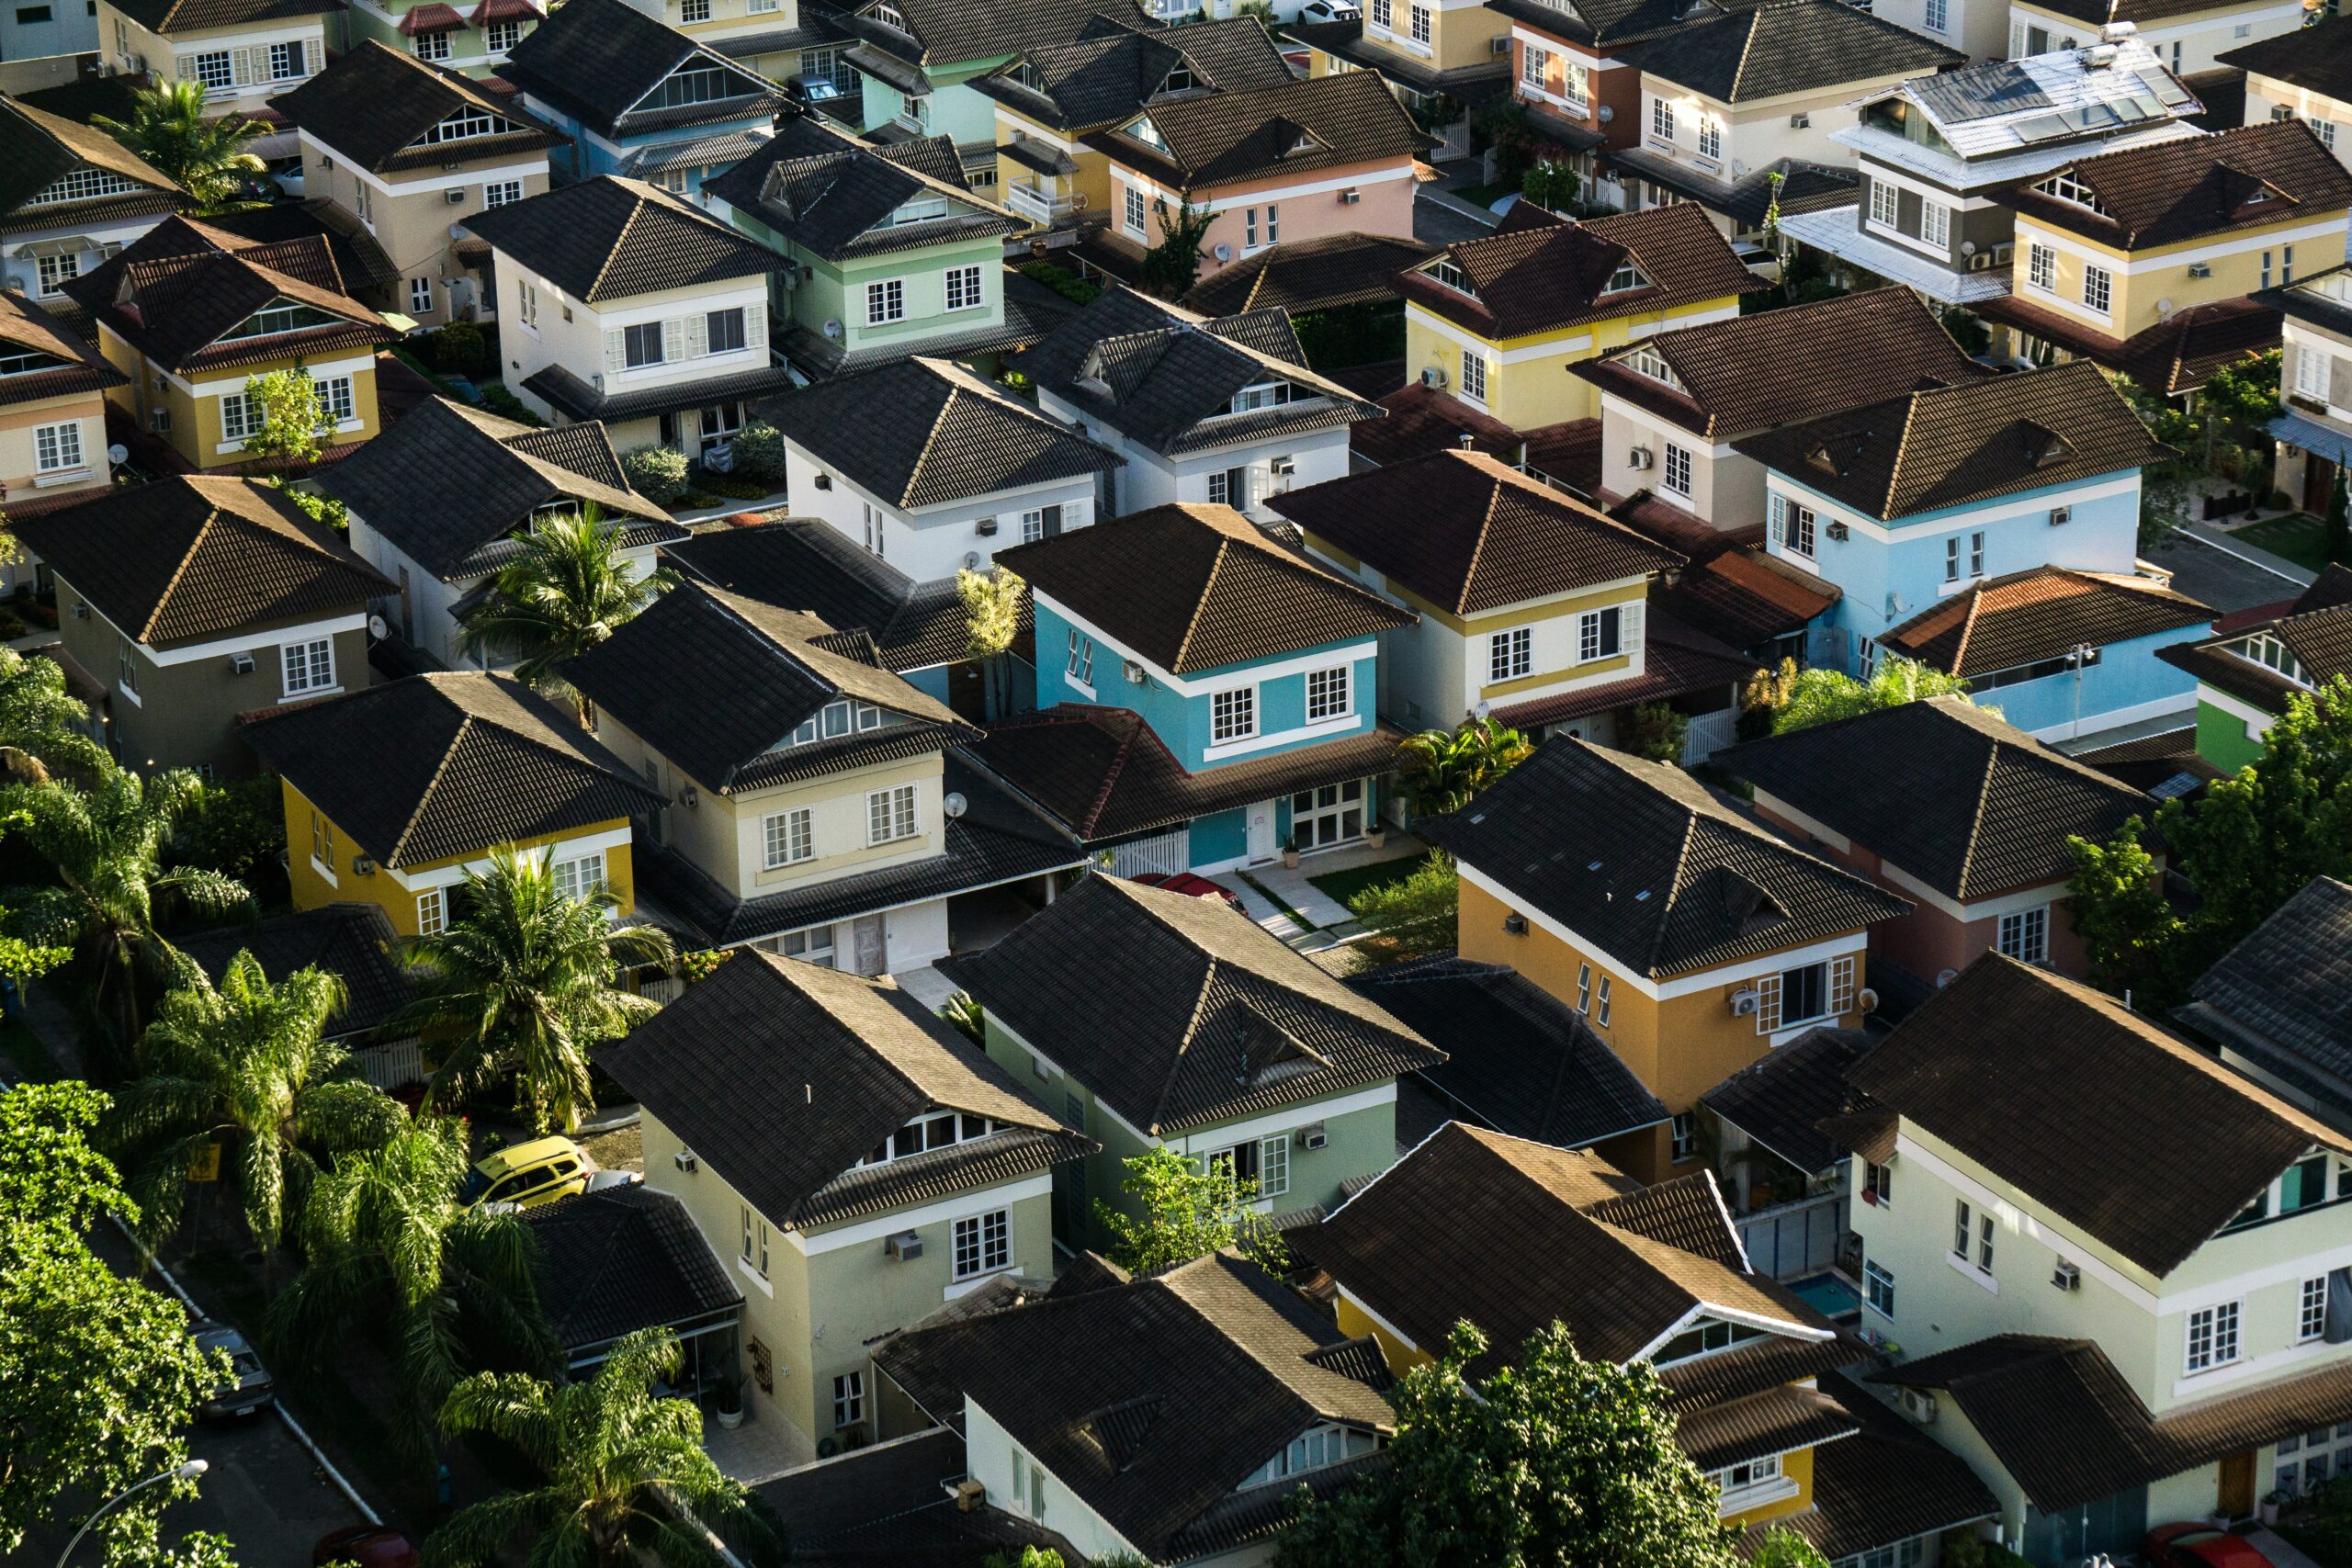 An aerial view of a neighborhood